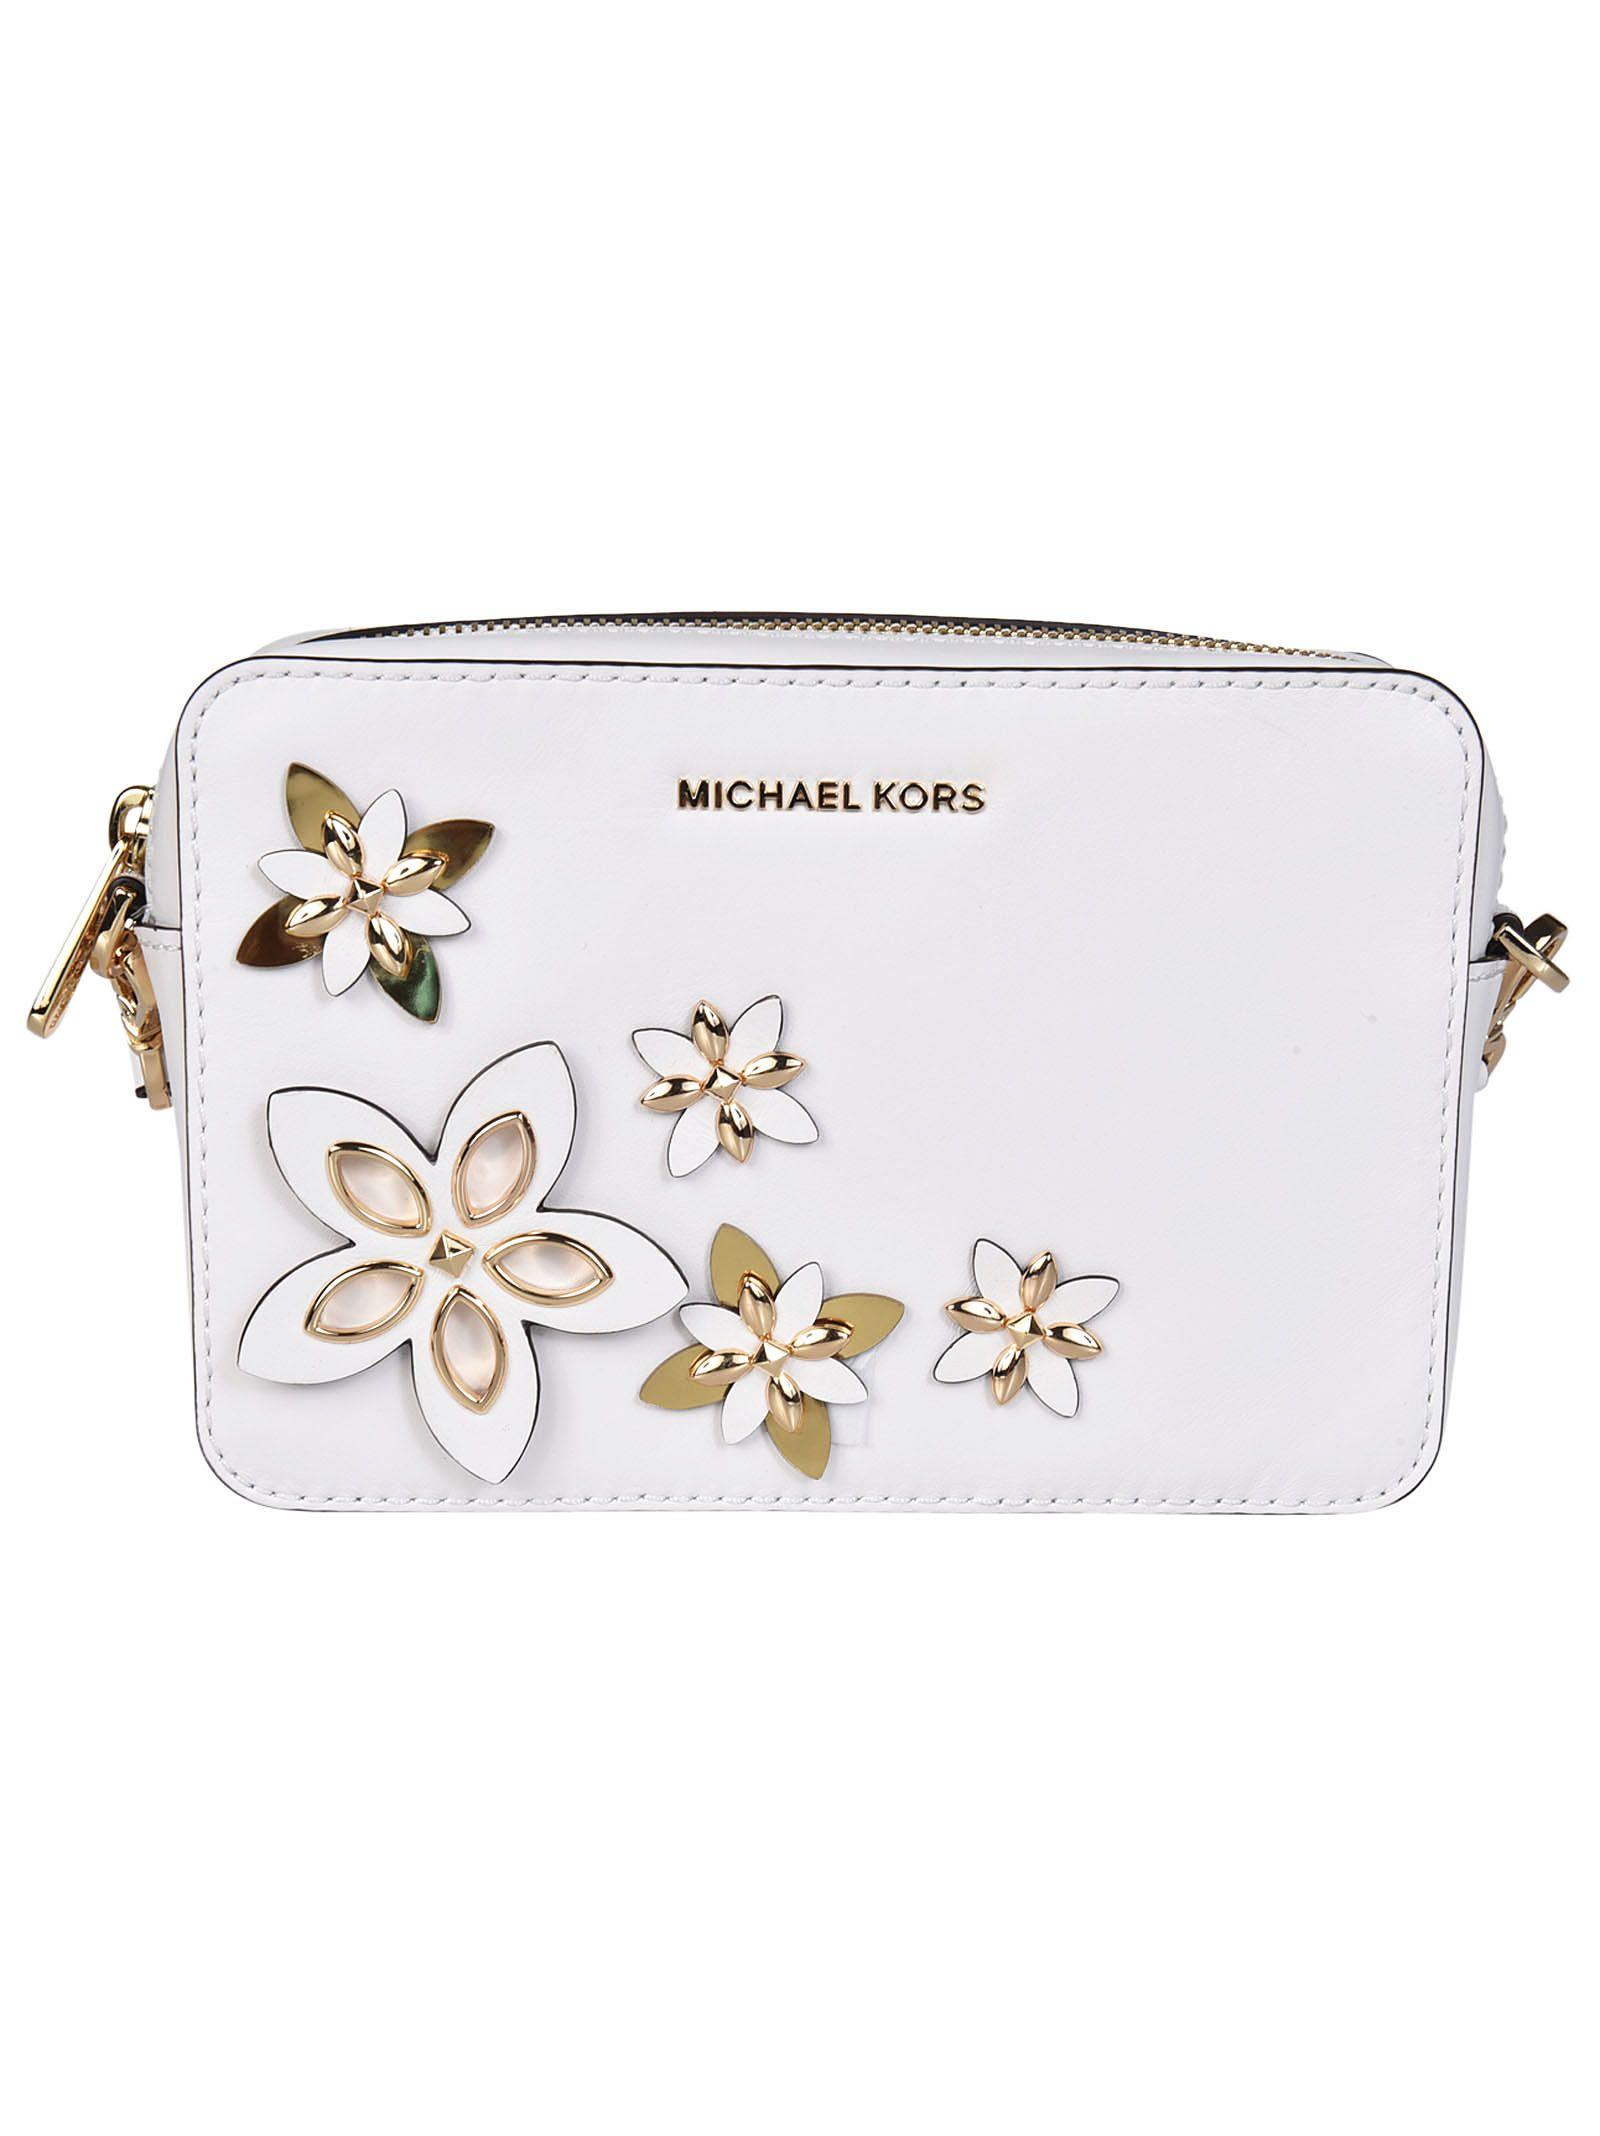 Michael Kors Floral Applique Shoulder Bag